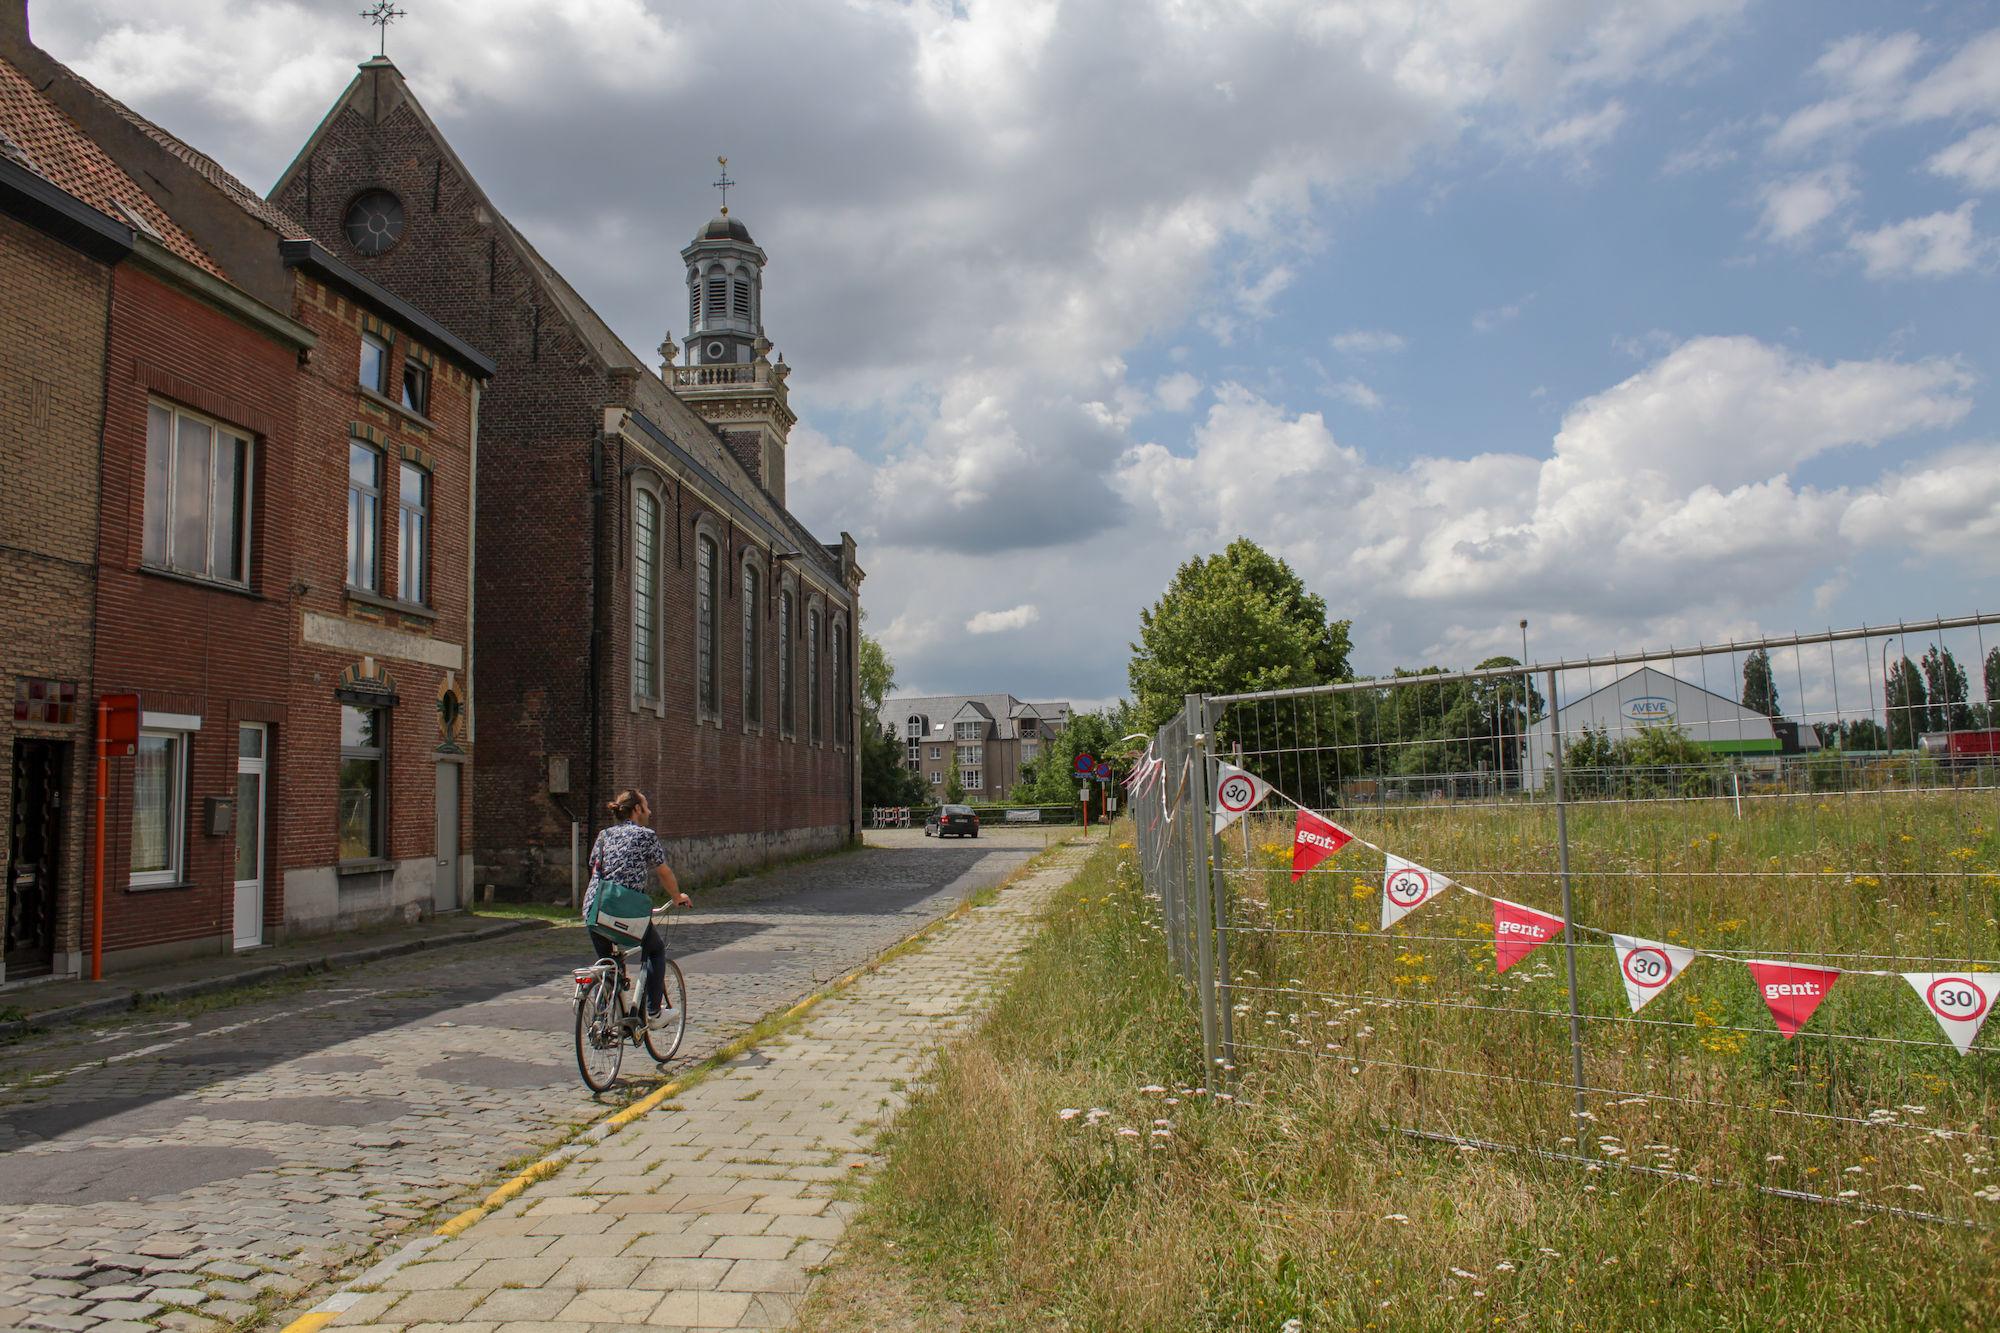 2019-07-02 Muide Meulestede prospectie Wannes_stadsvernieuwing_IMG_0362-3.jpg